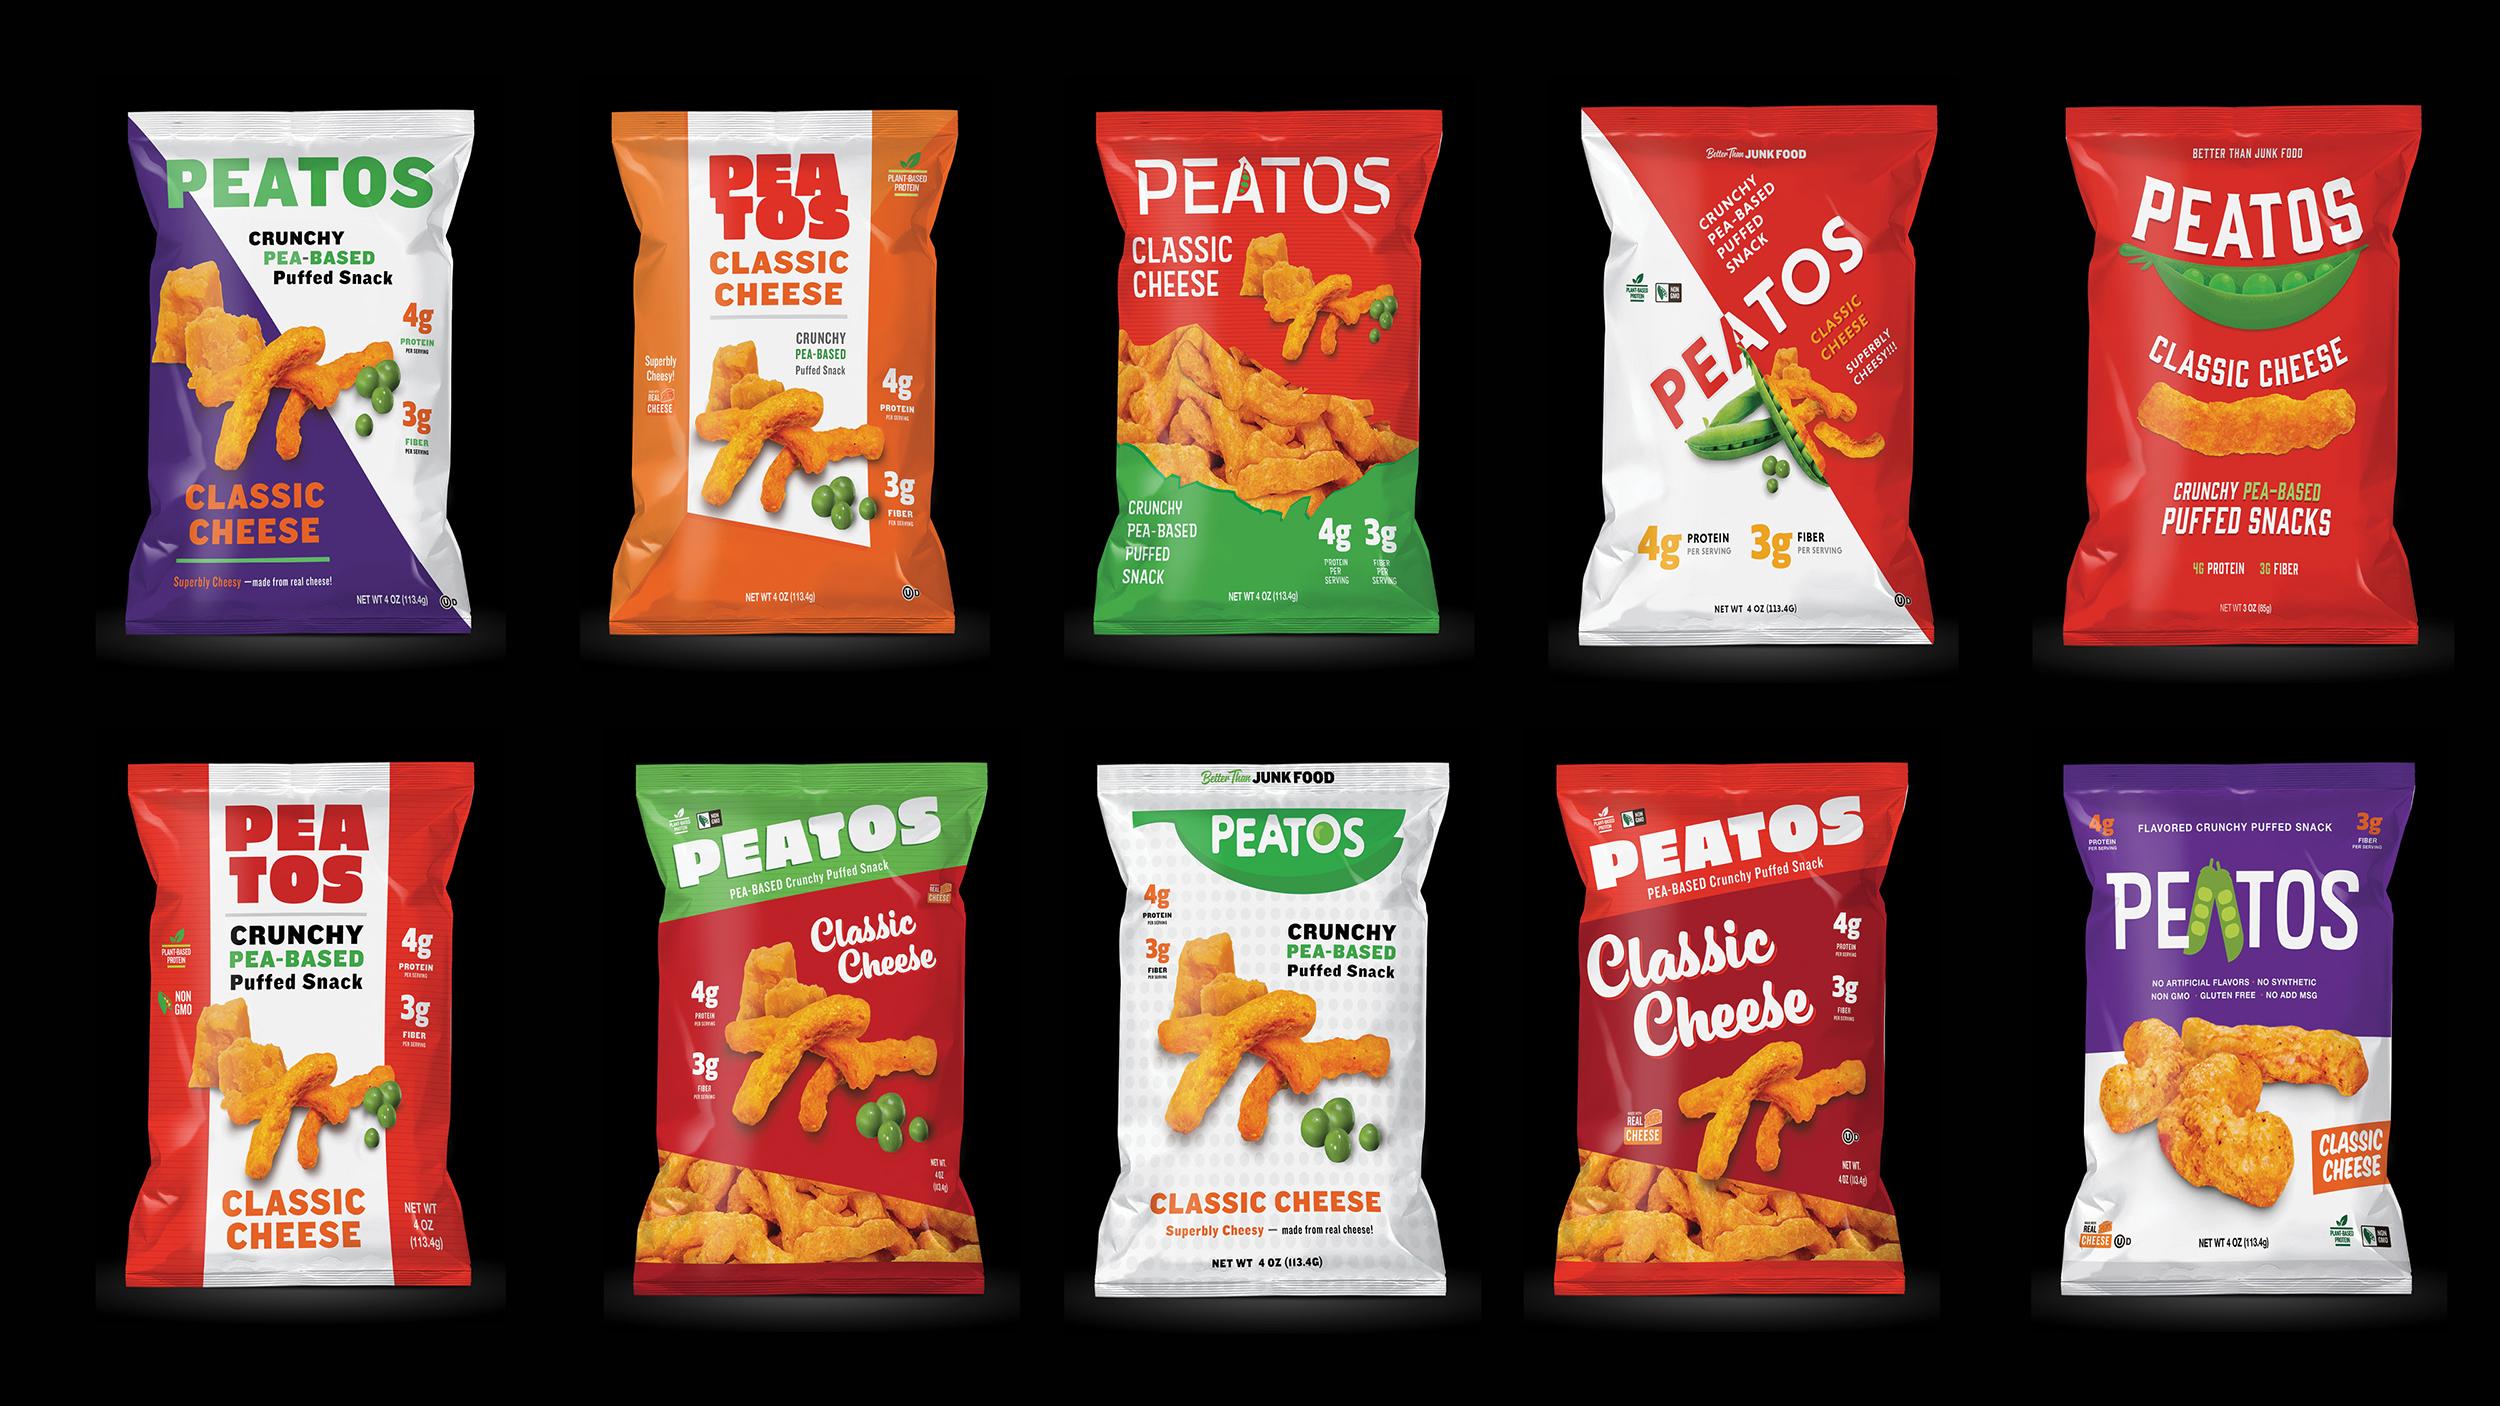 New branding bag packaging design explorations. Illustrator & Photoshop CC.